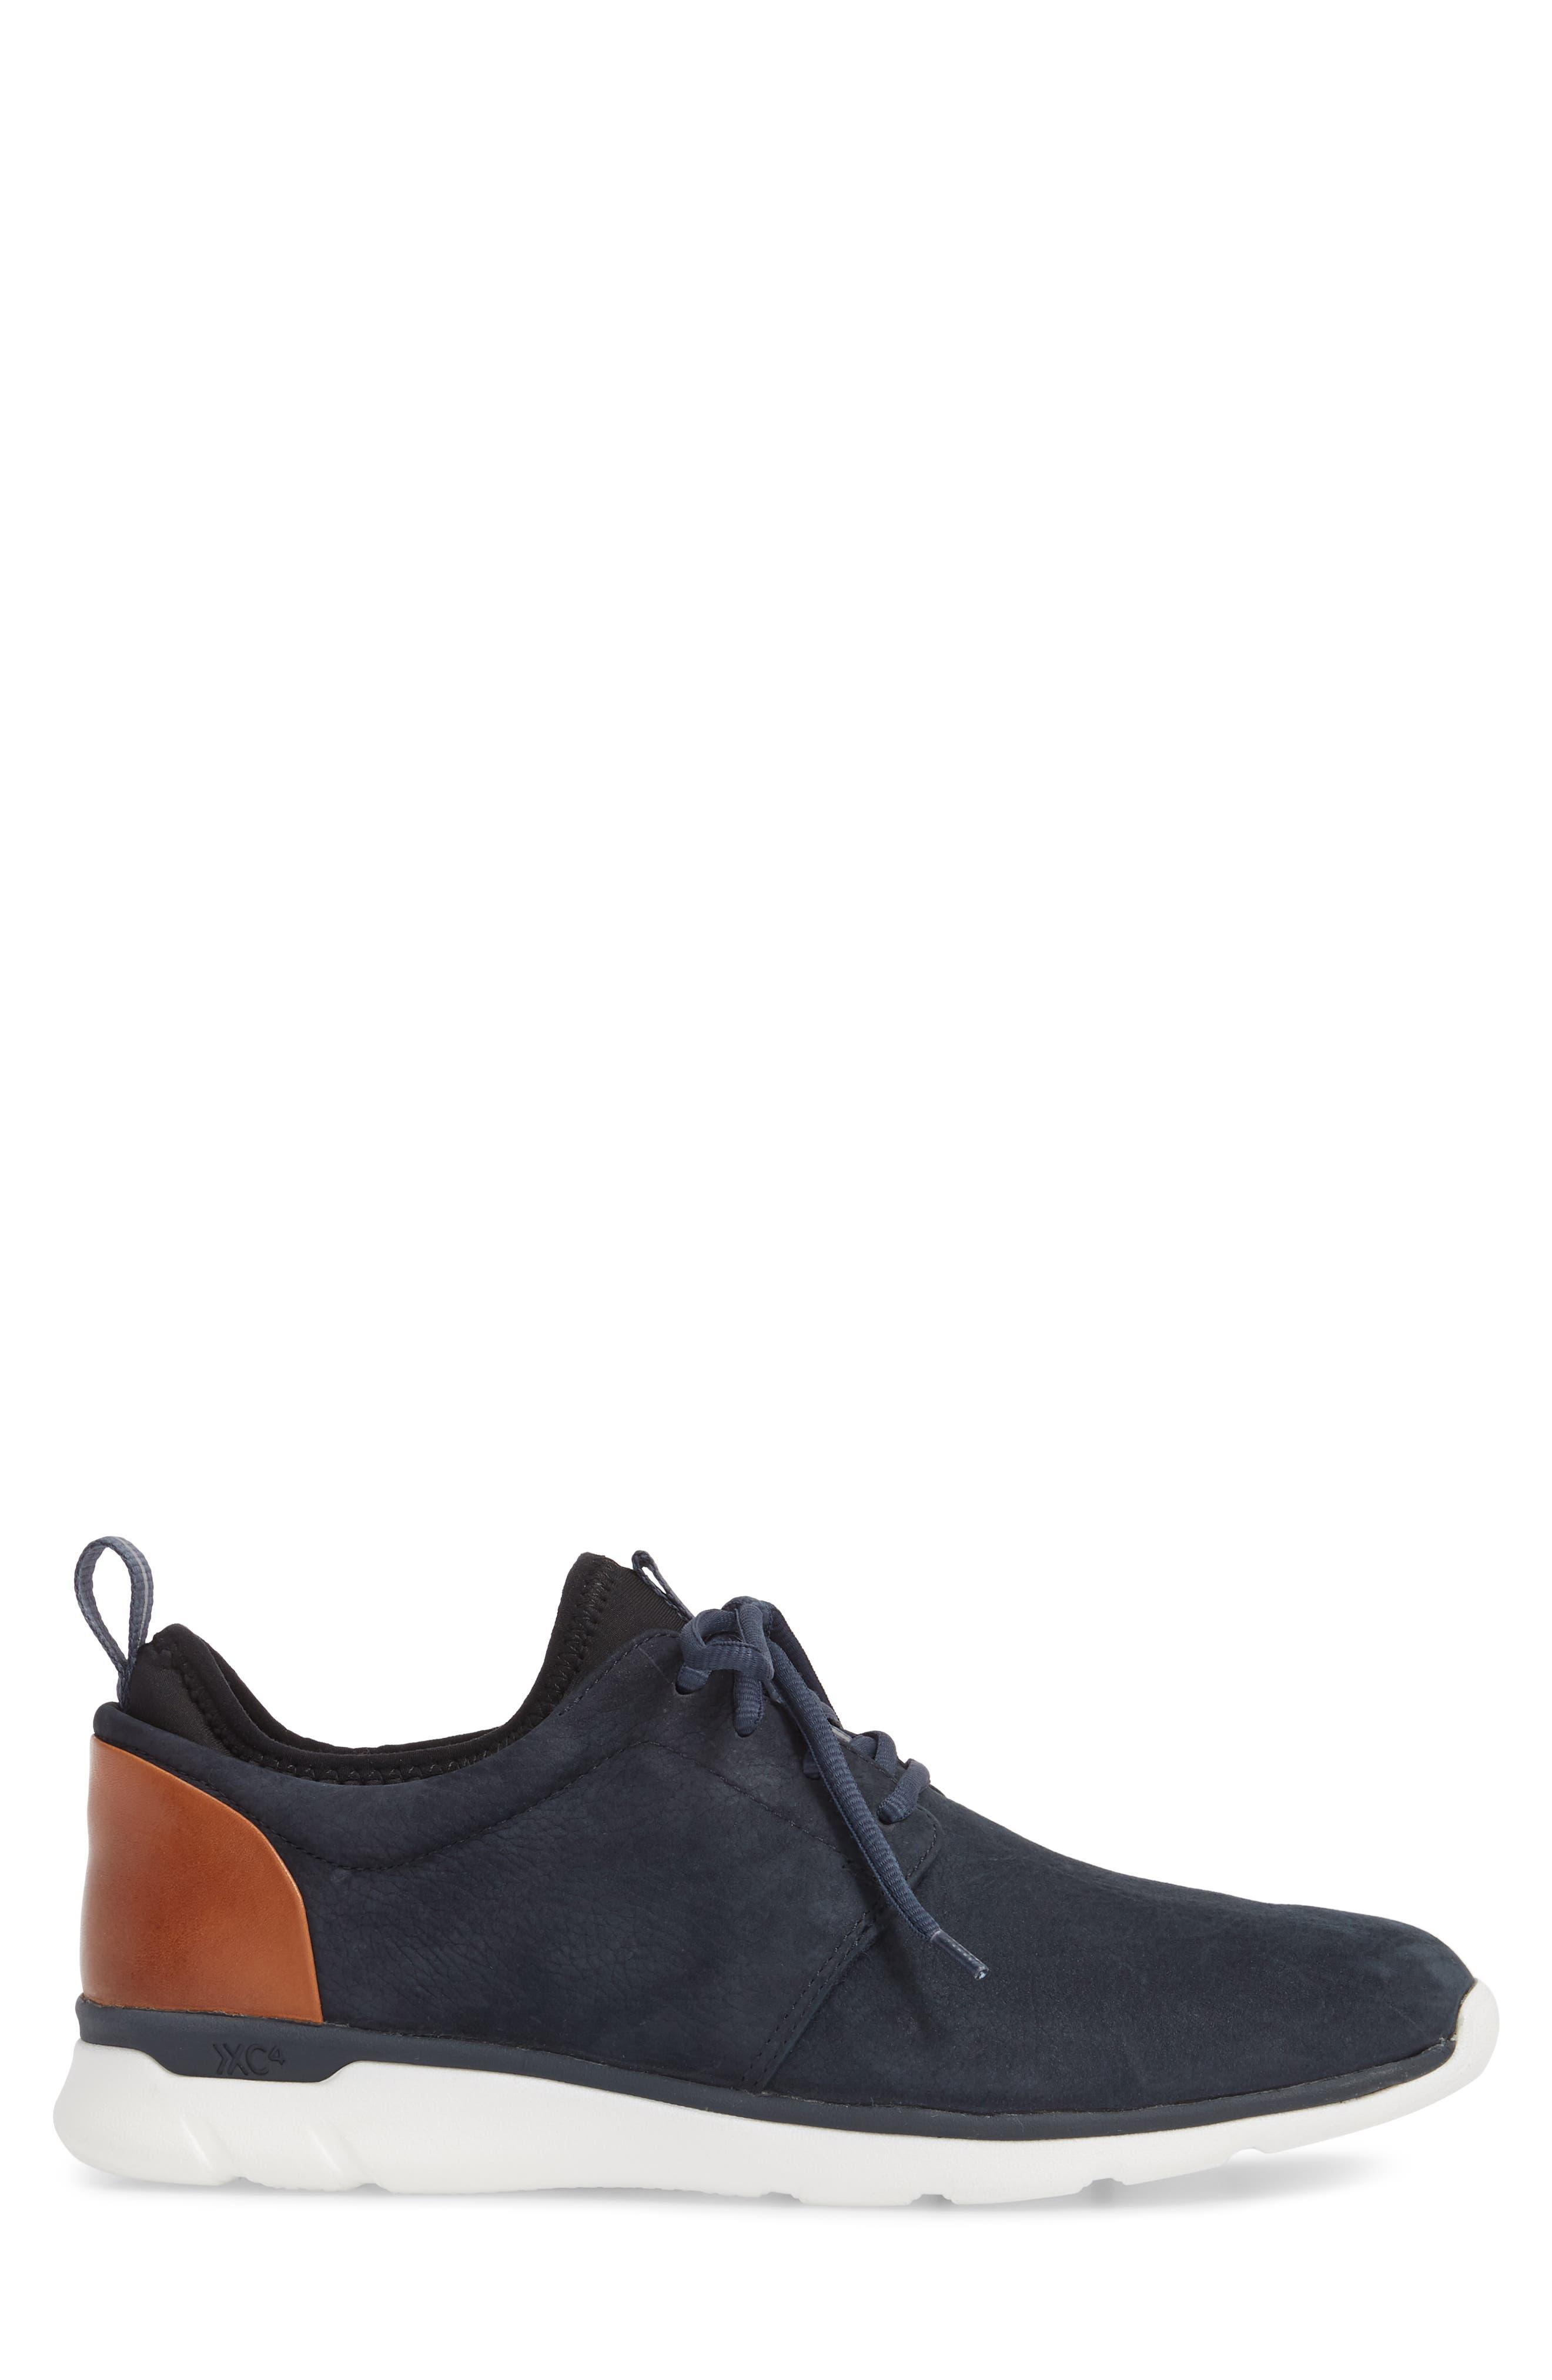 Prentiss XC4<sup>®</sup> Waterproof Low Top Sneaker,                             Alternate thumbnail 3, color,                             Navy Nubuck